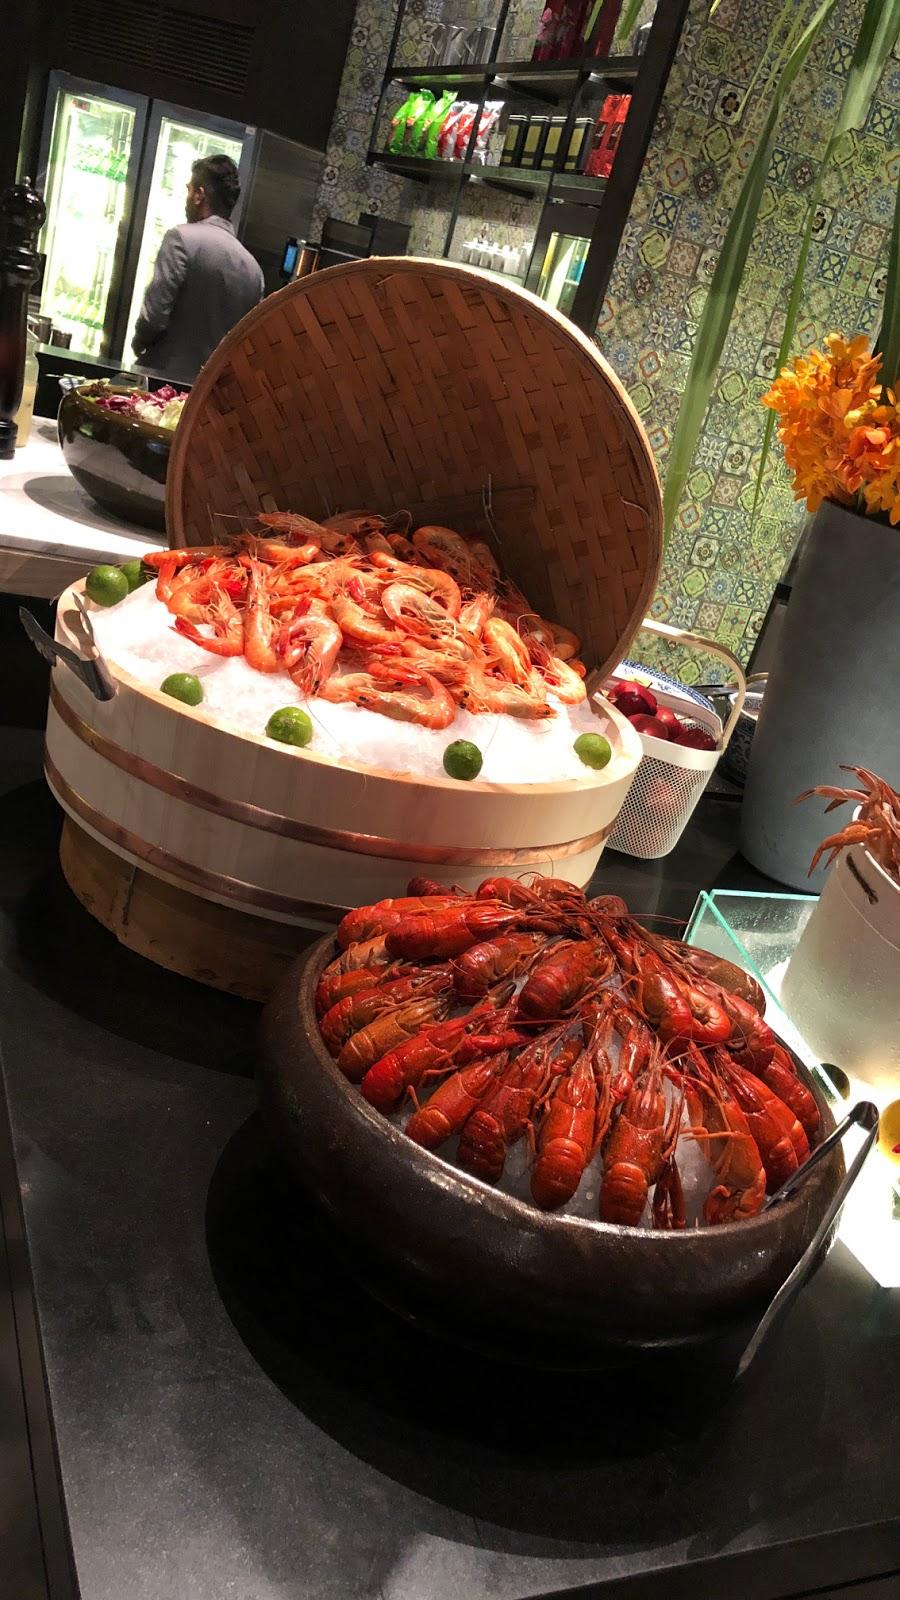 New World Petaling Jaya Hotel presents an Exquisite